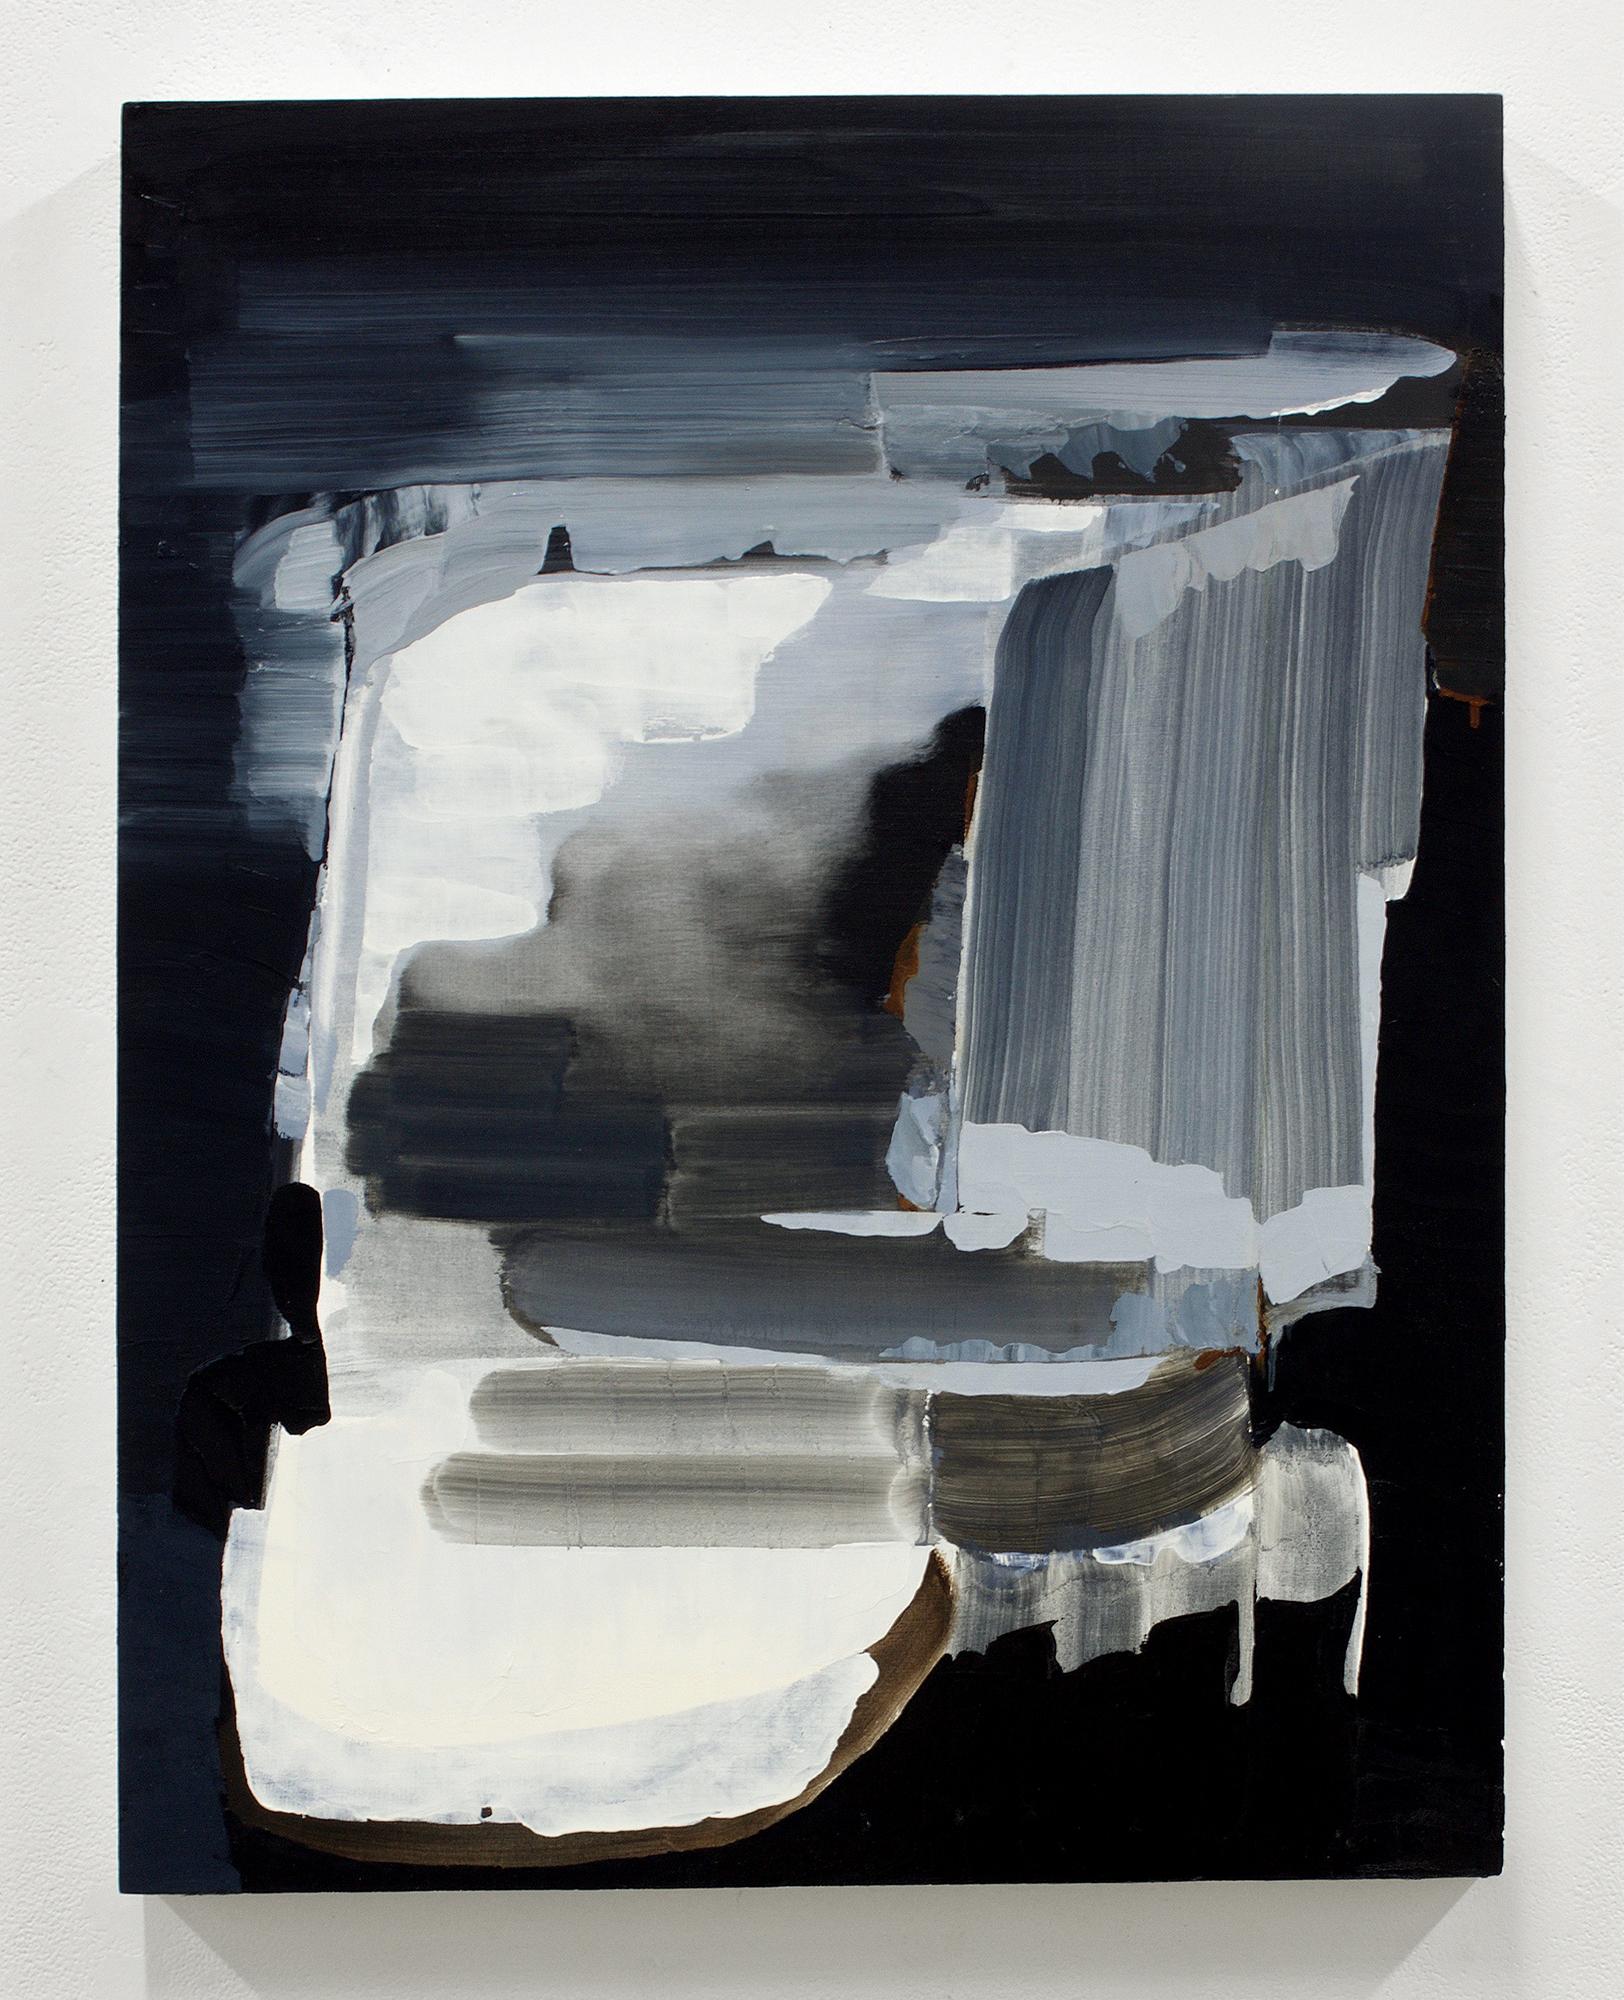 Untitled, 2016